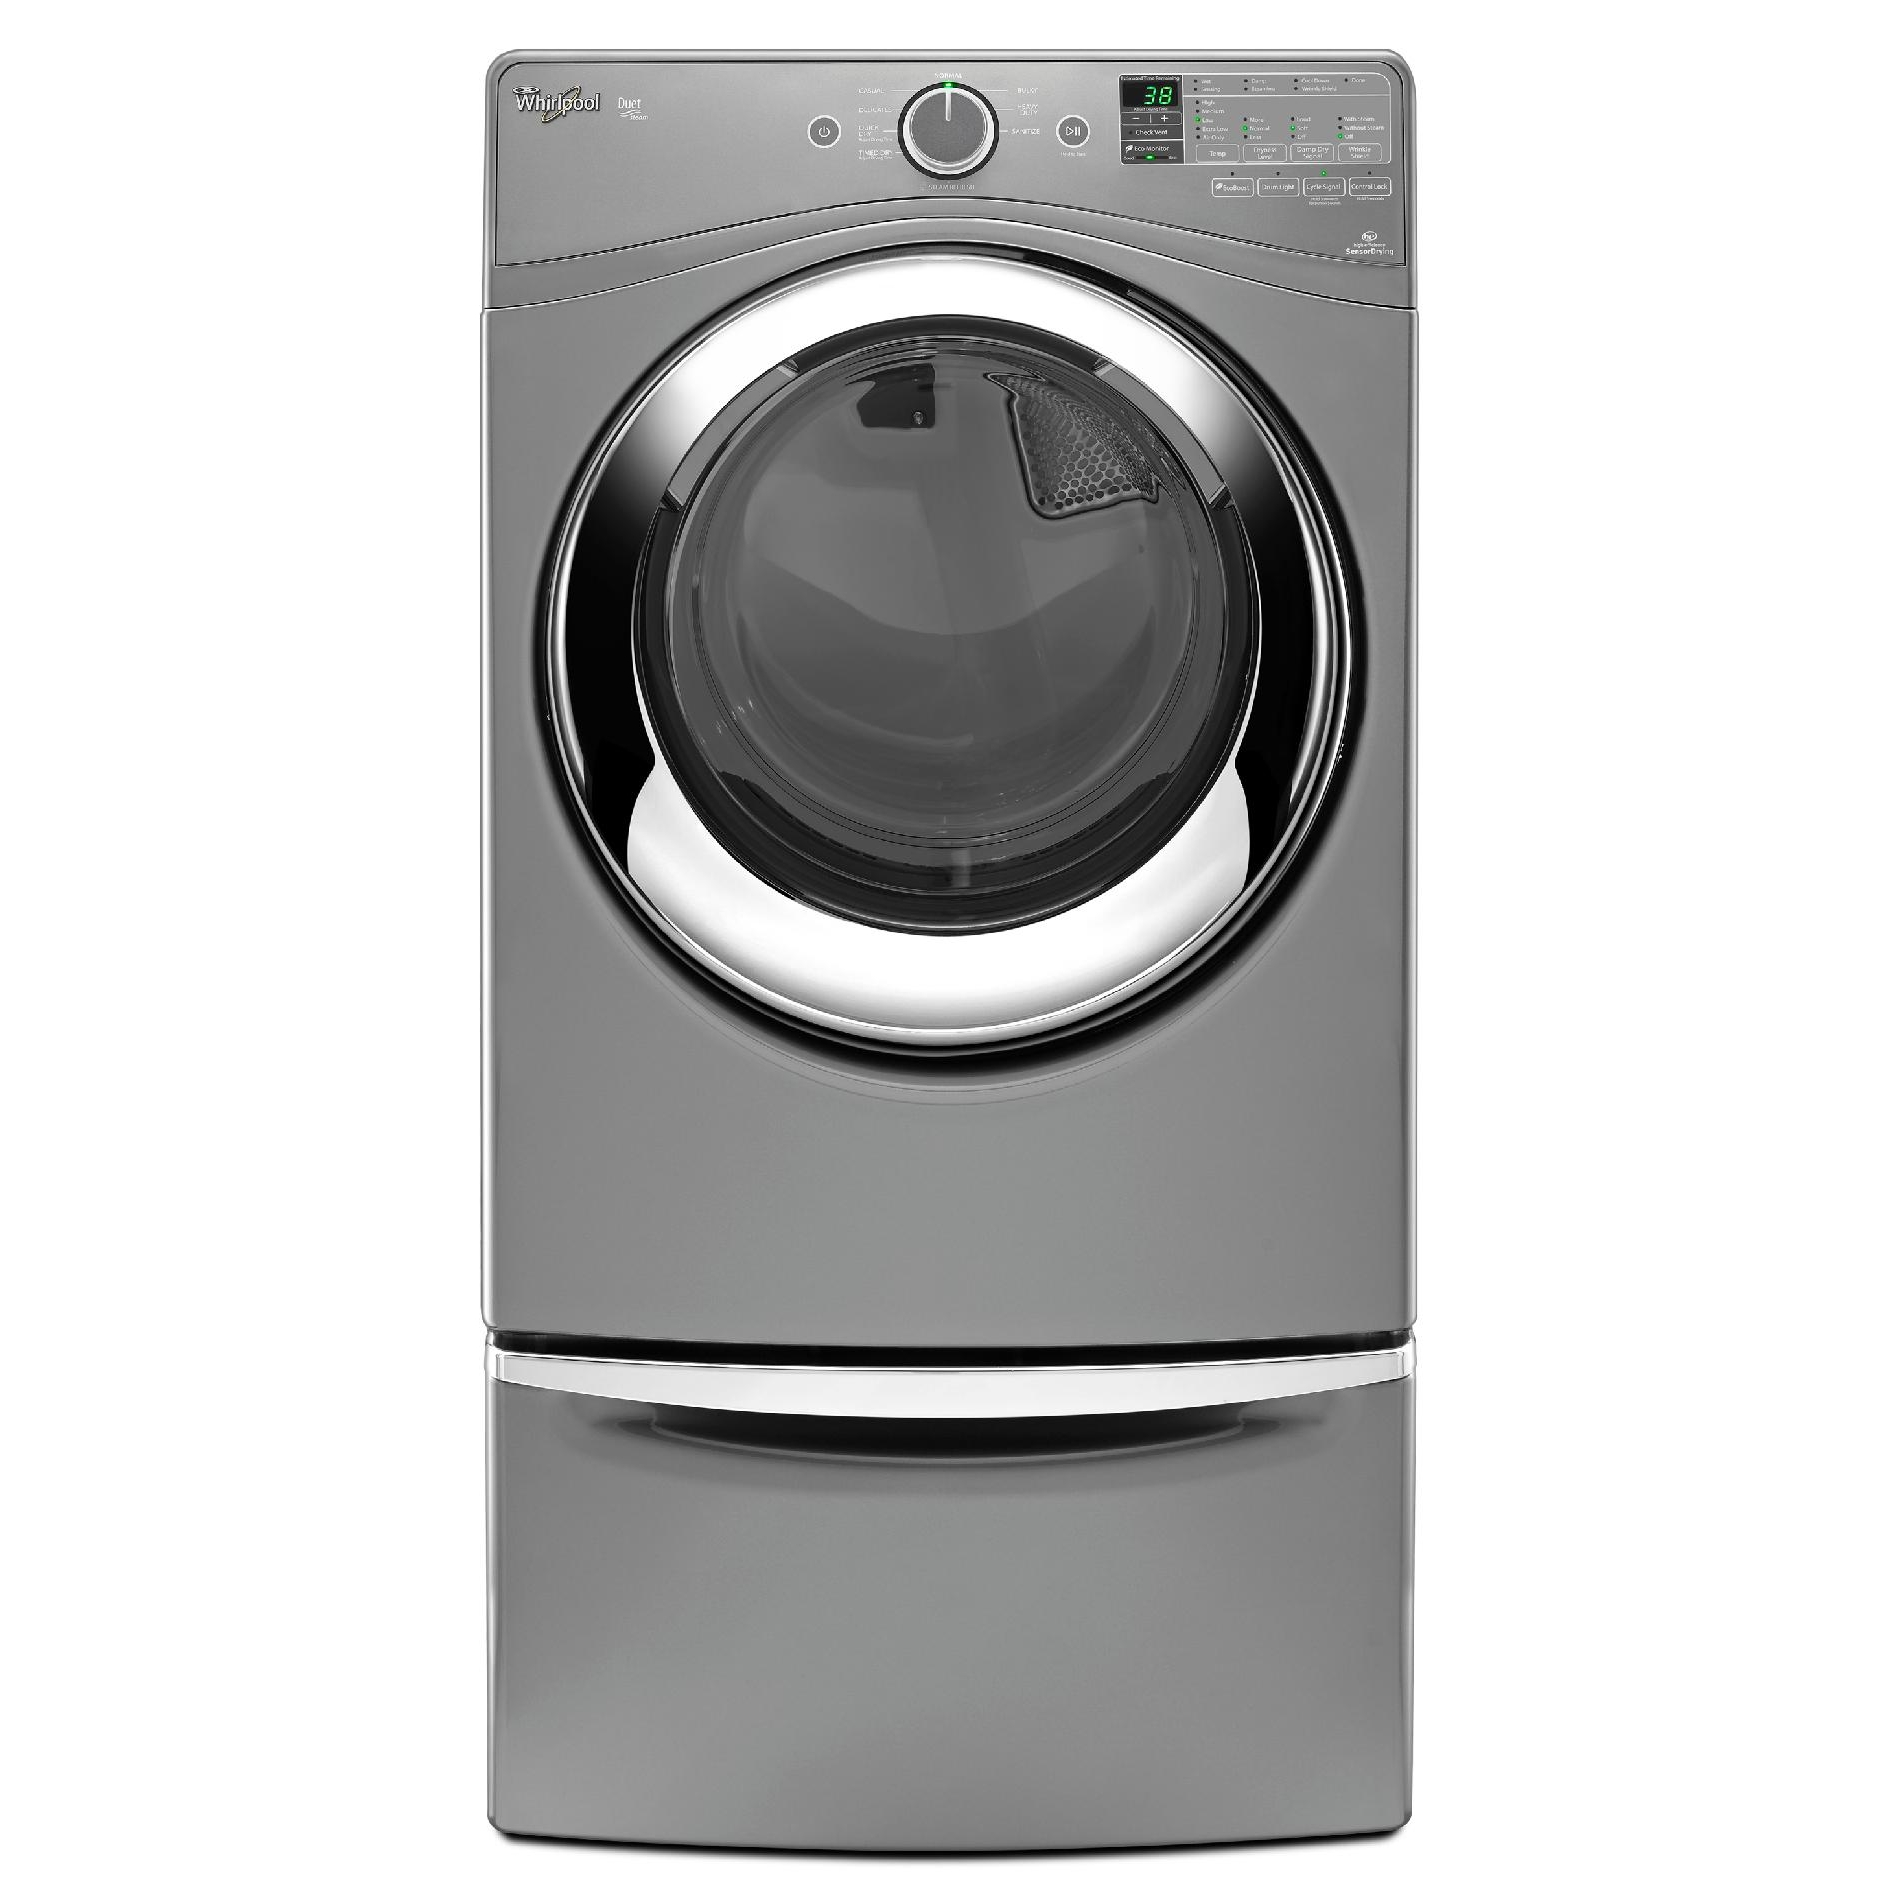 Whirlpool WGD98HEDC 7.4 cu. ft. Duet® Gas Dryer w/ Steam Refresh - Chrome Shadow